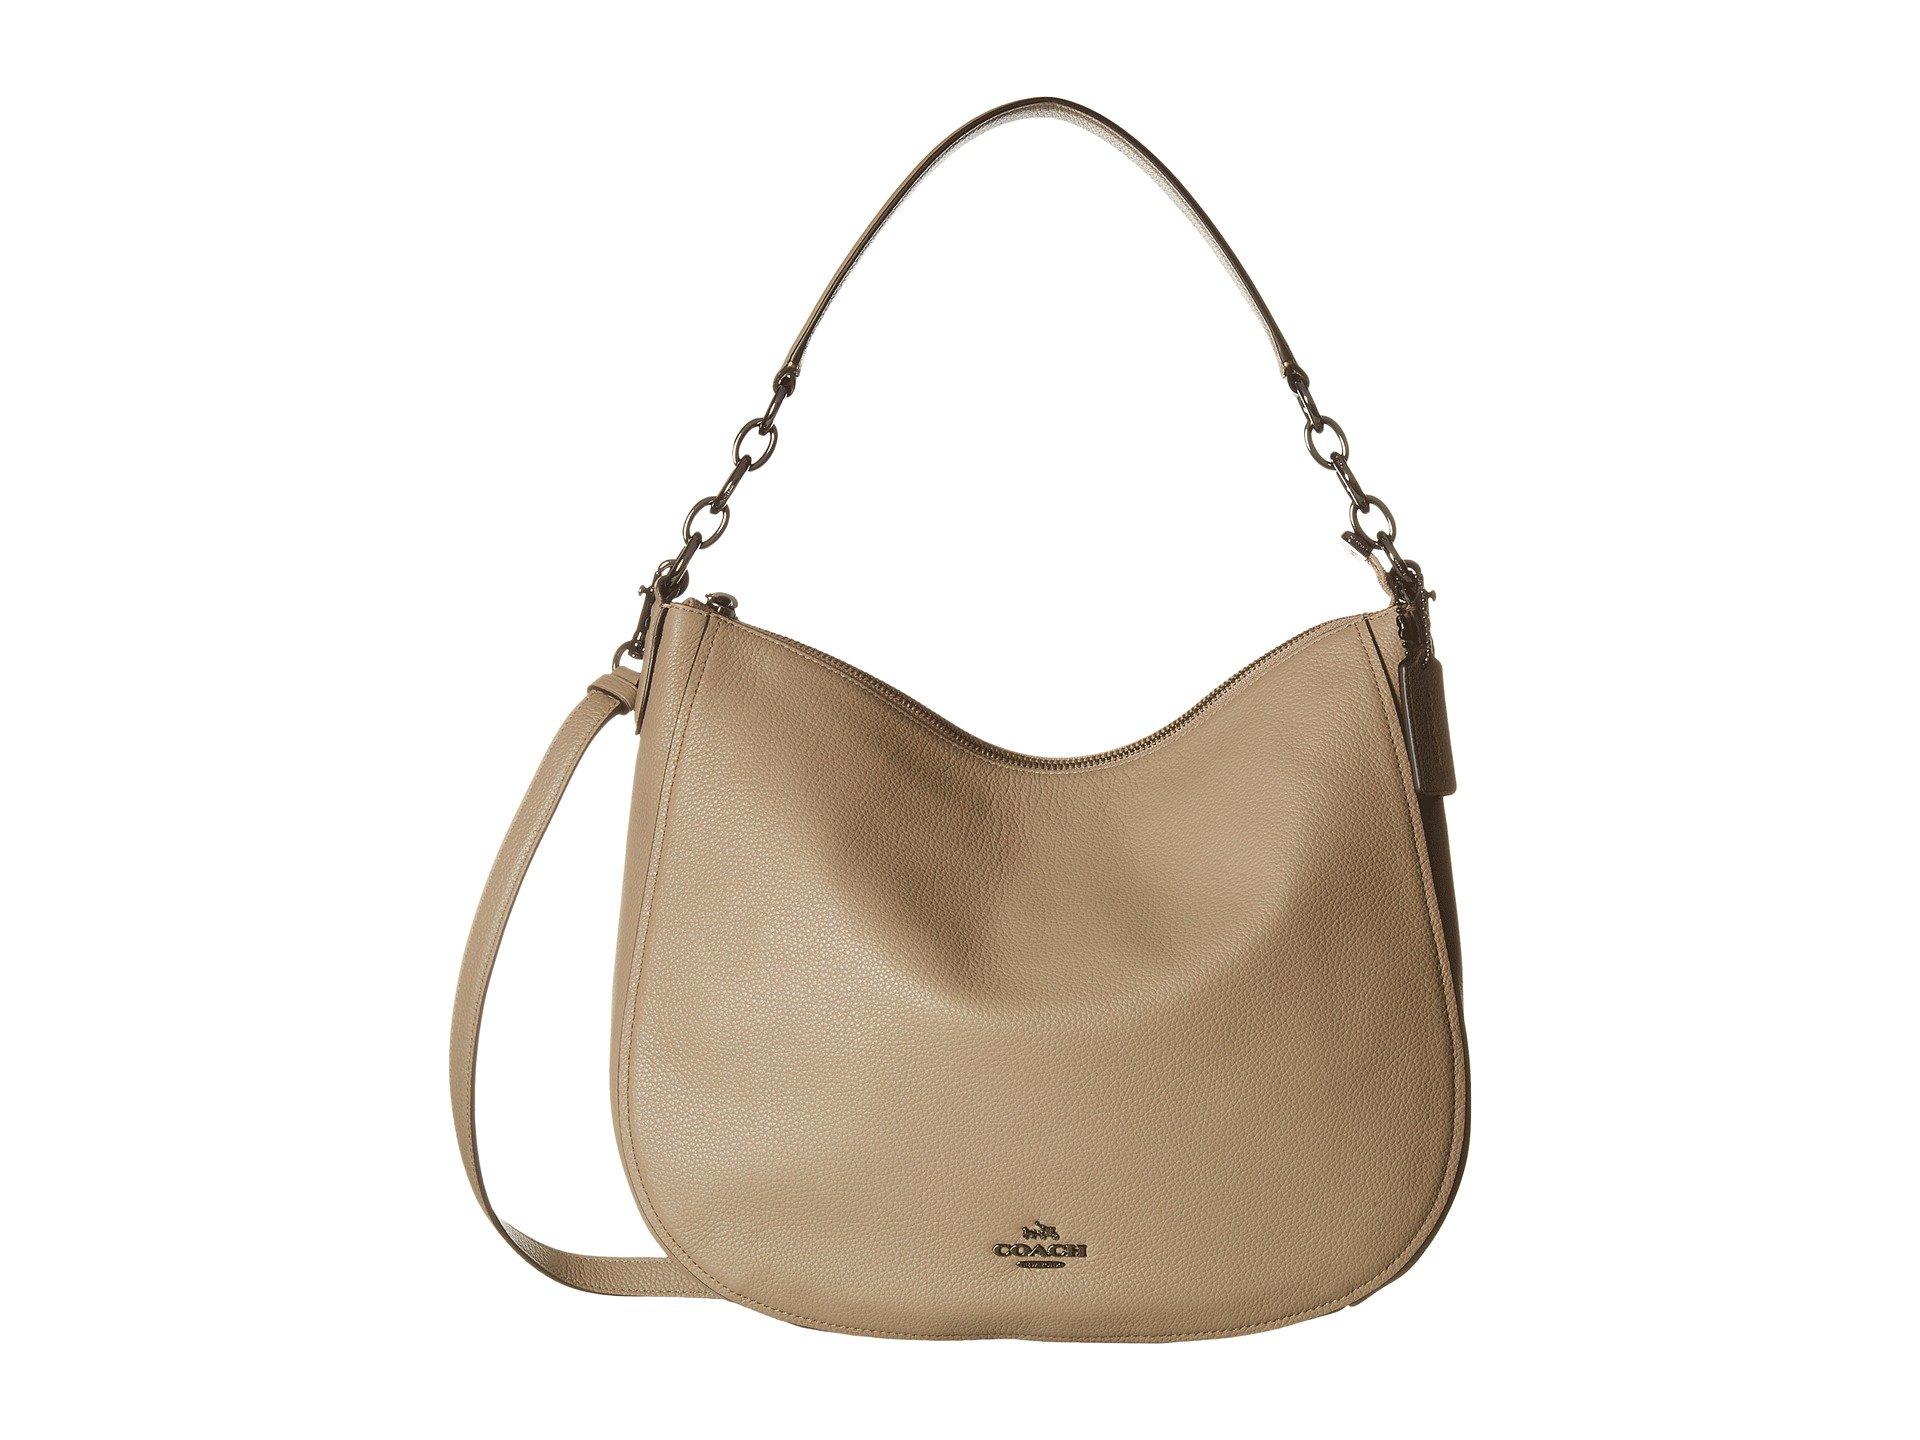 COACH Women's Polished Pebbled Leather Chelsea 32 Hobo Dk/Stone Handbag